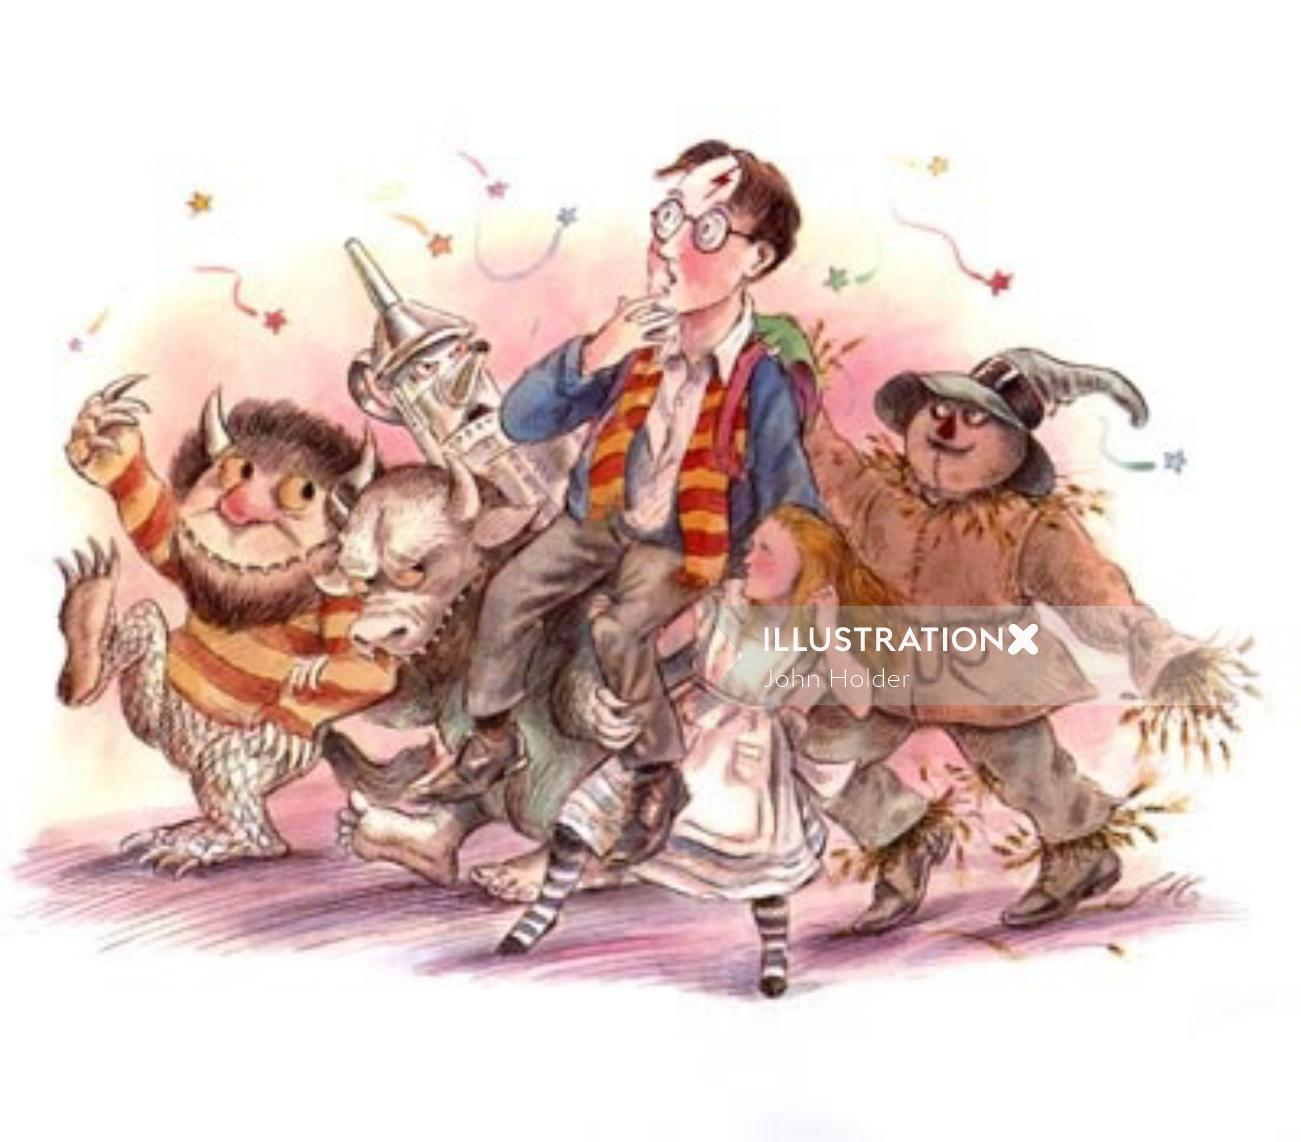 Cartoon illustration for children's book